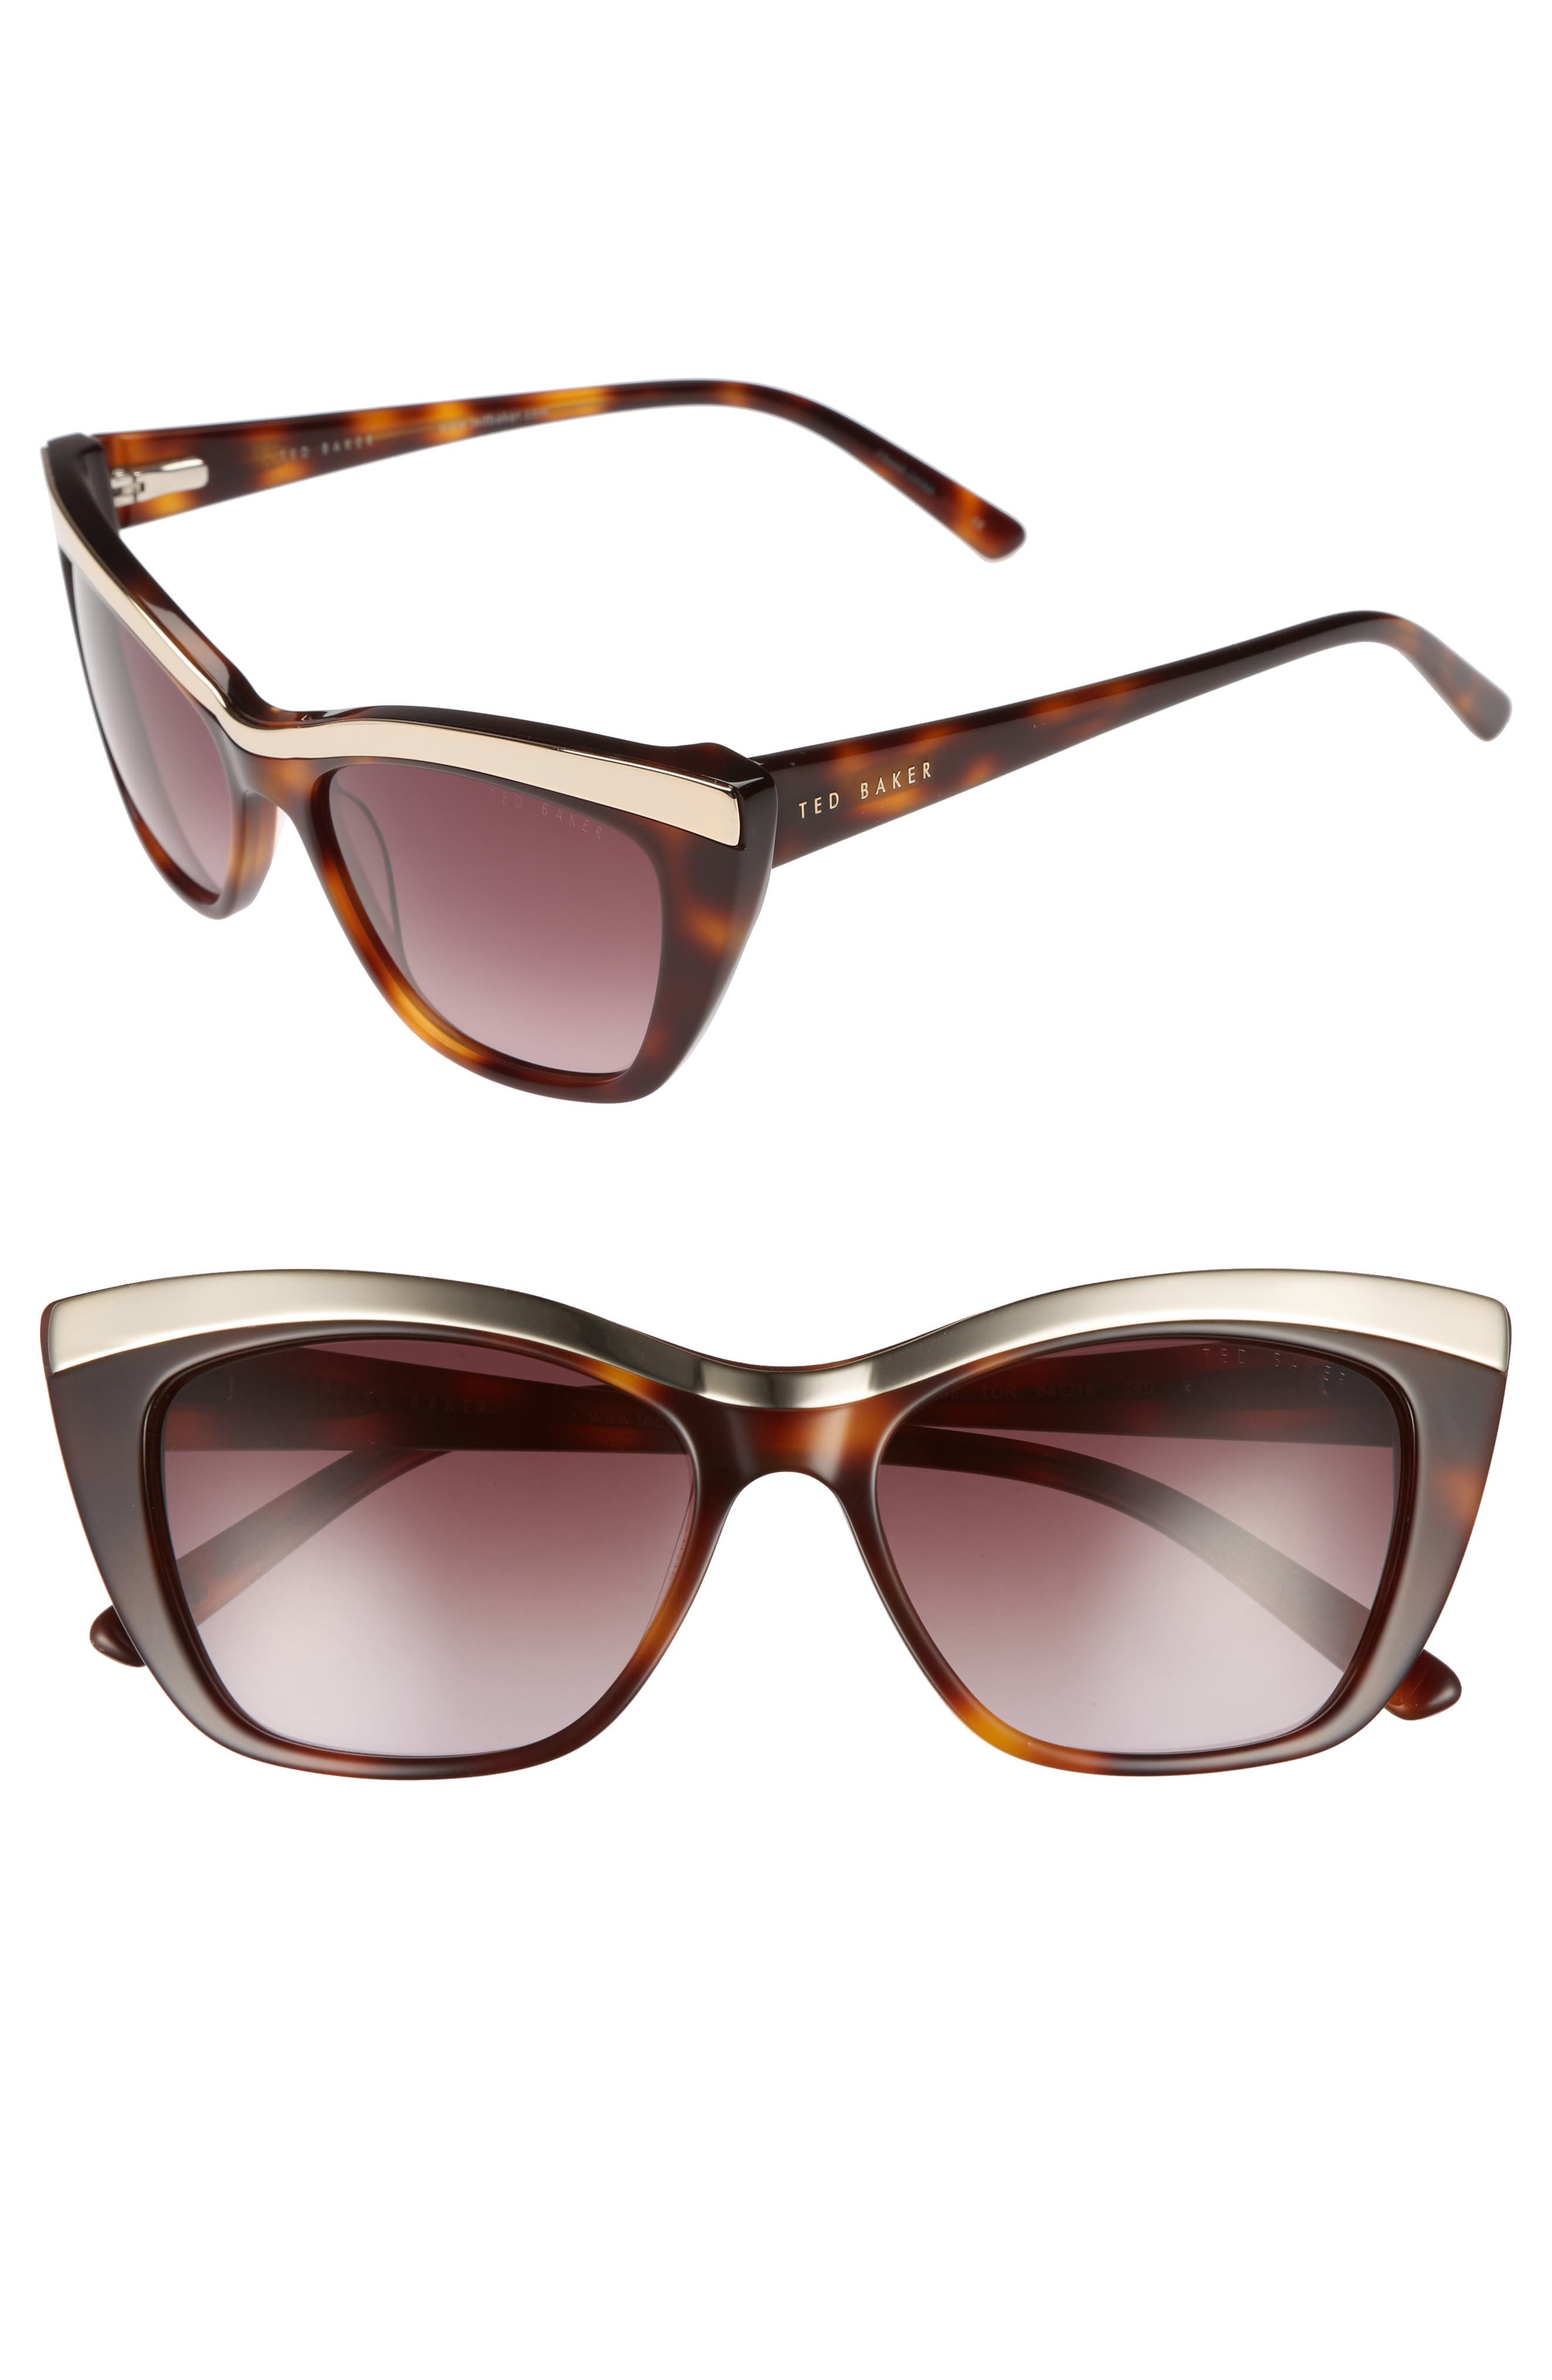 54mm Rectangle Cat Eye Sunglasses,                         Main,                         color, Tortoise